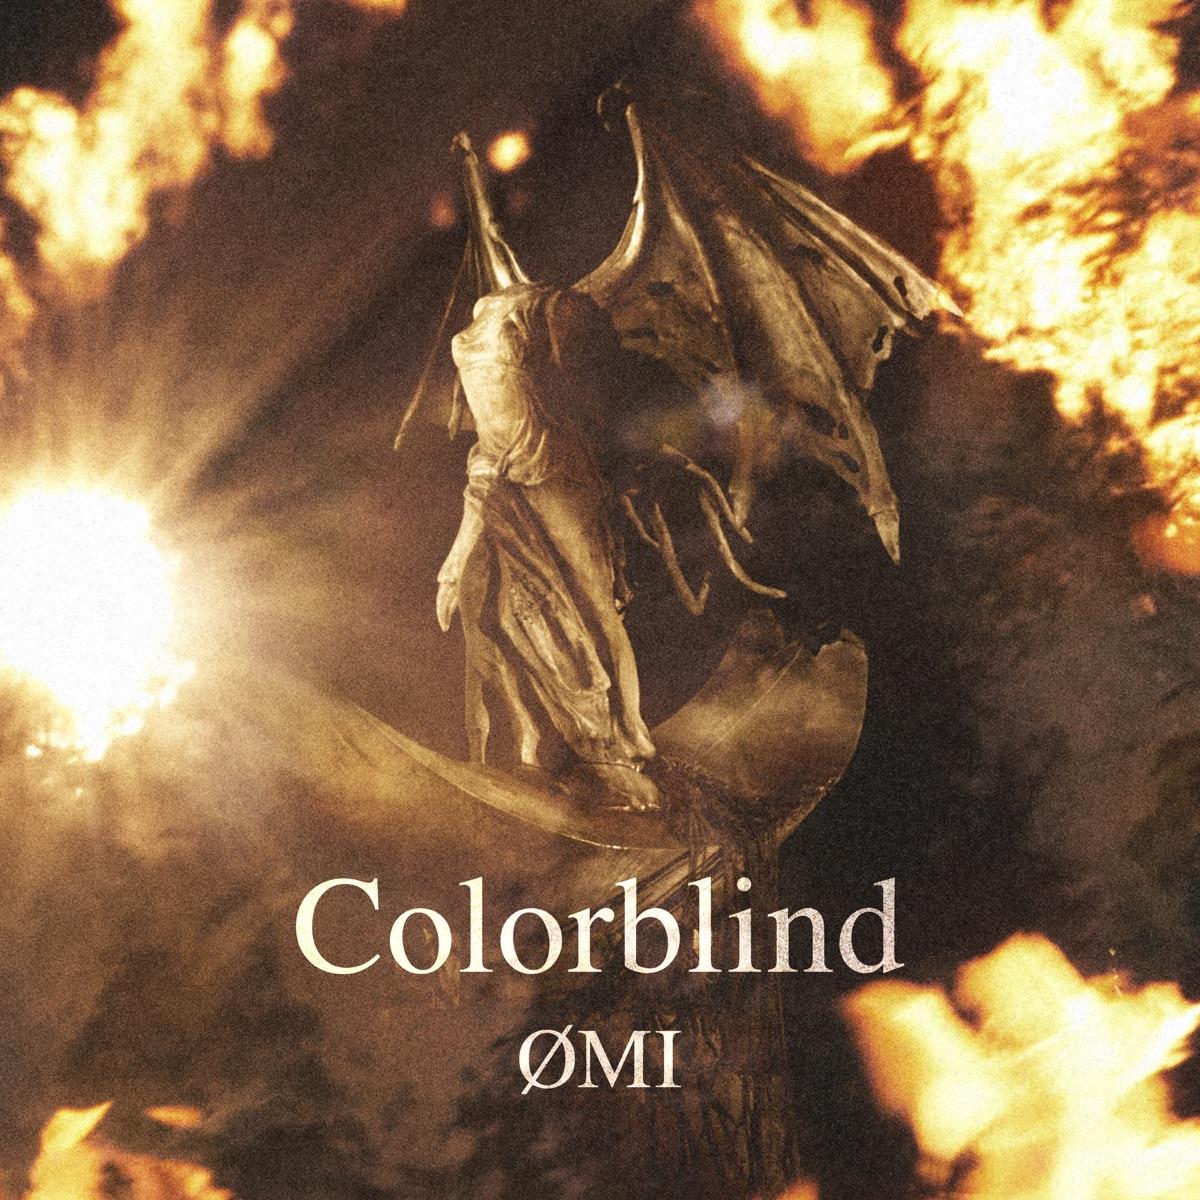 『ØMI - Colorblind』収録の『Colorblind』ジャケット